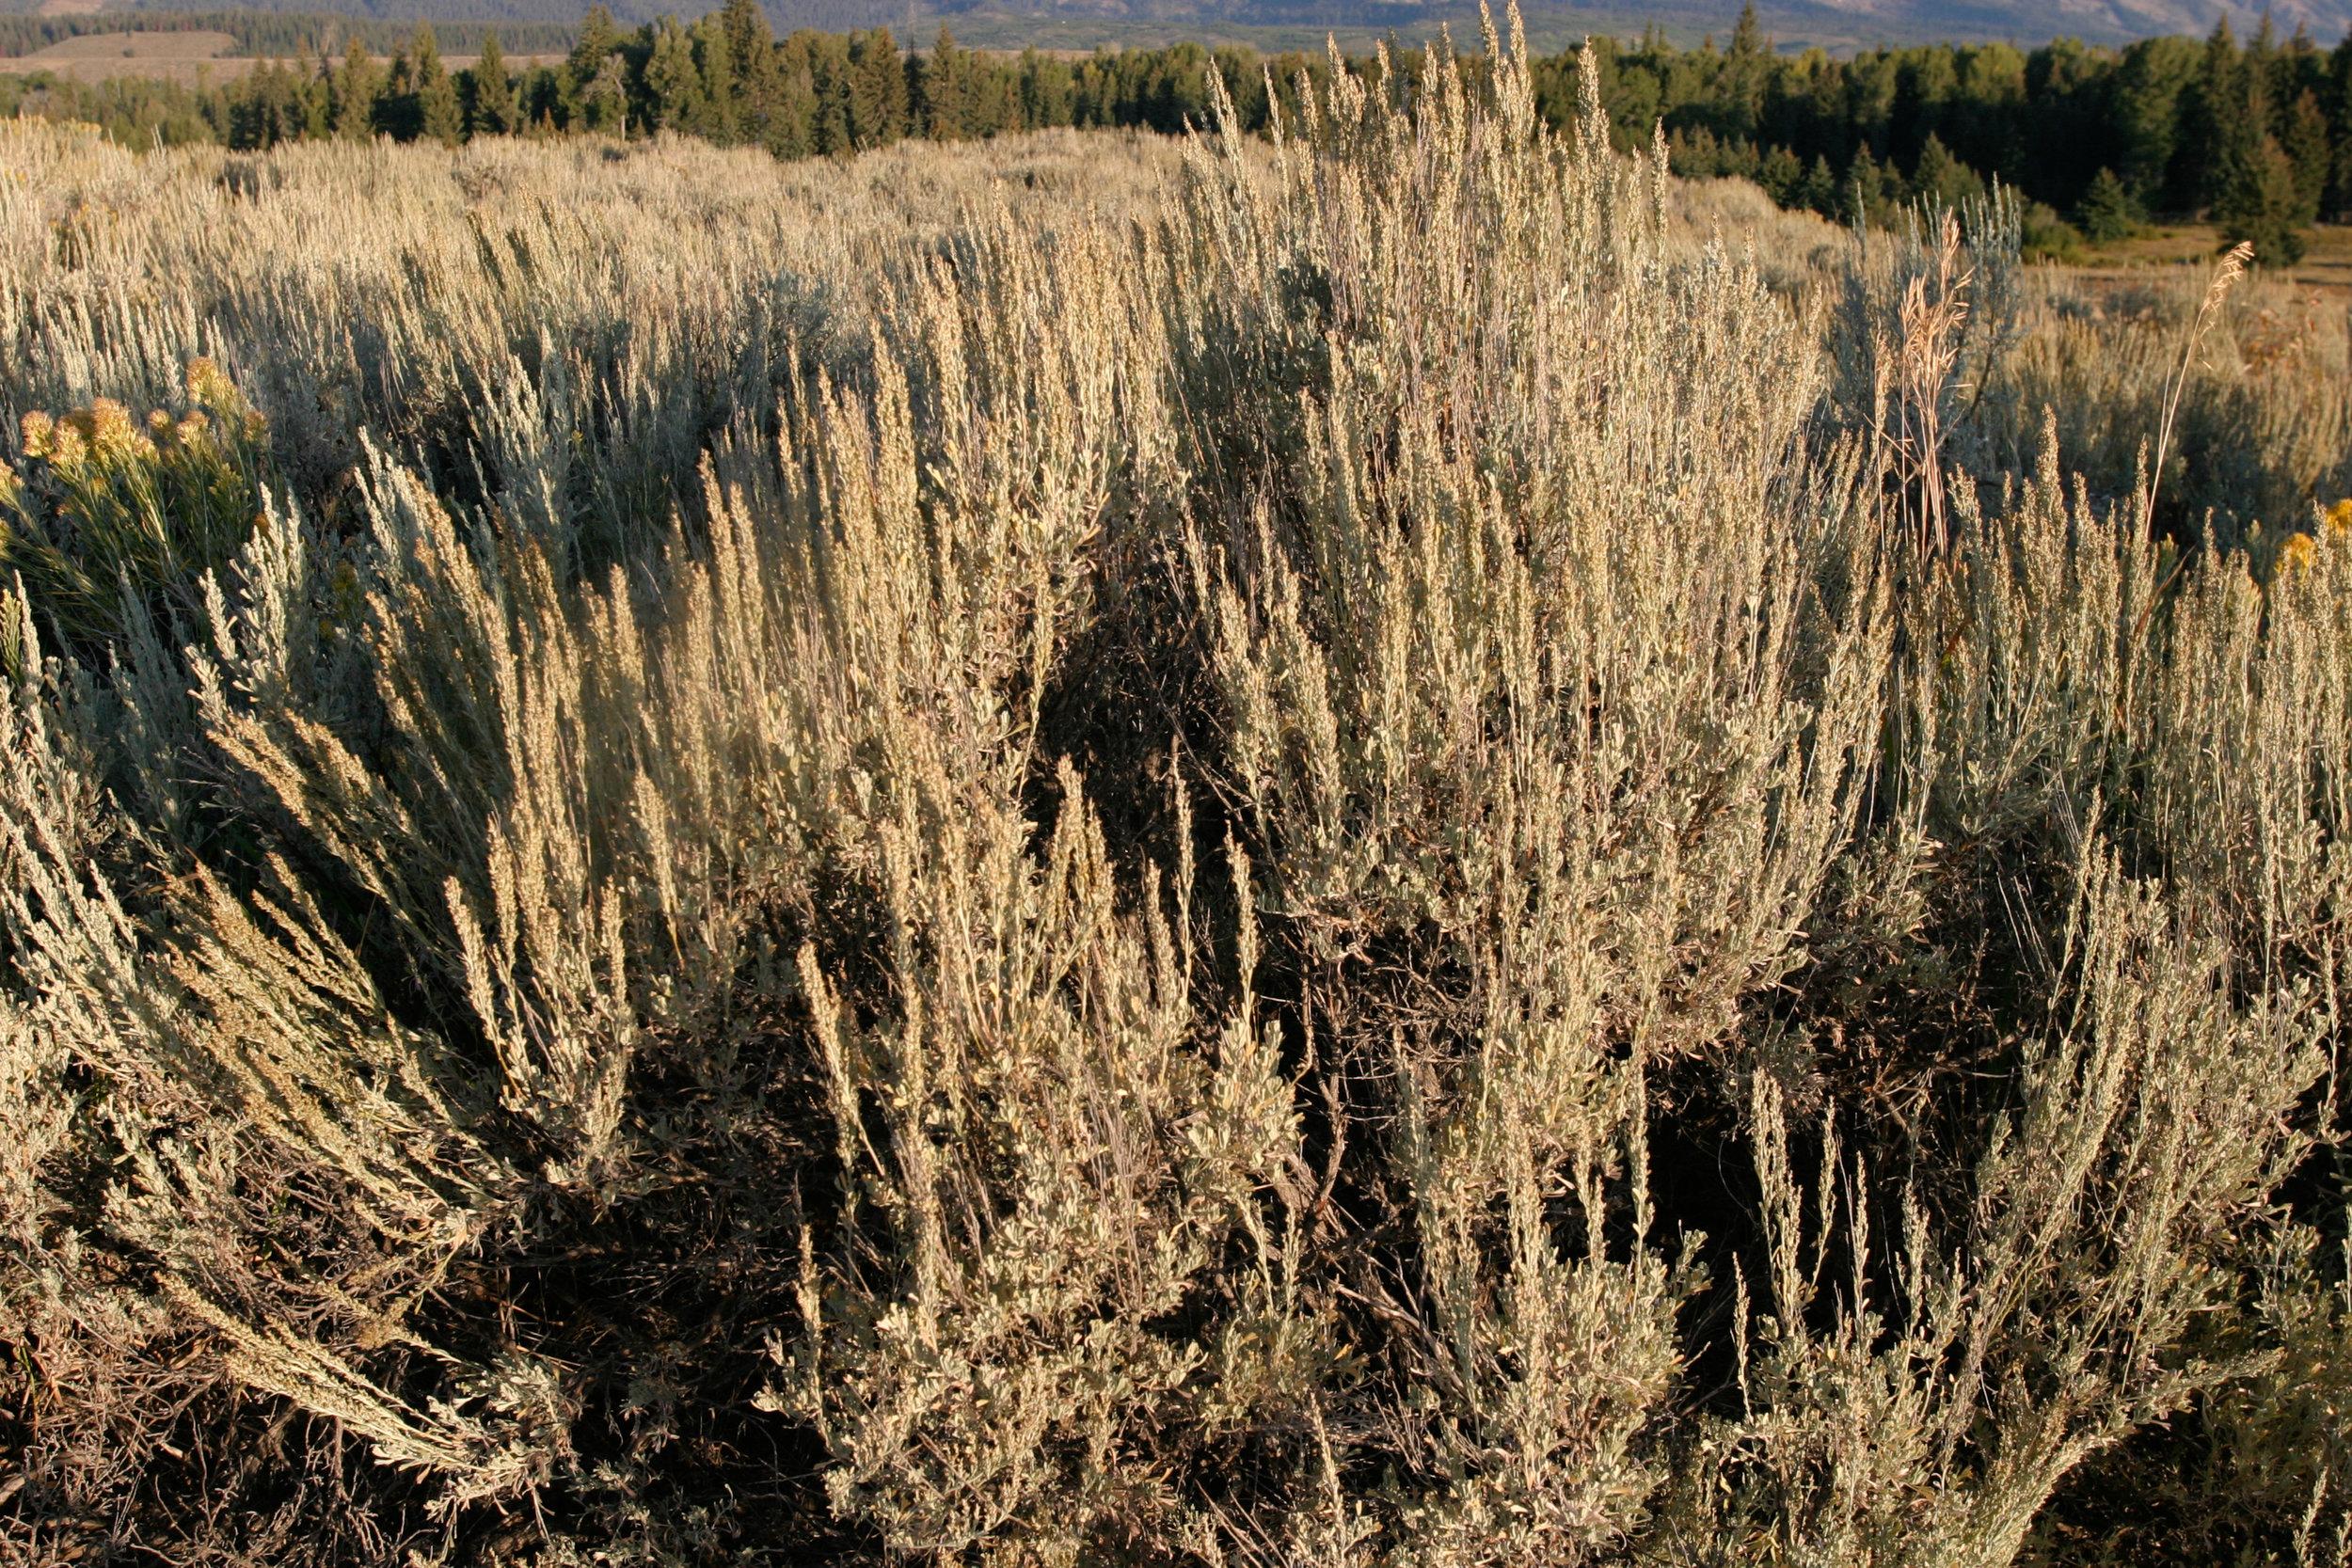 Artemistia tridentata ssp. wyomingensis (Wyoming big sagebrush) 2.jpg